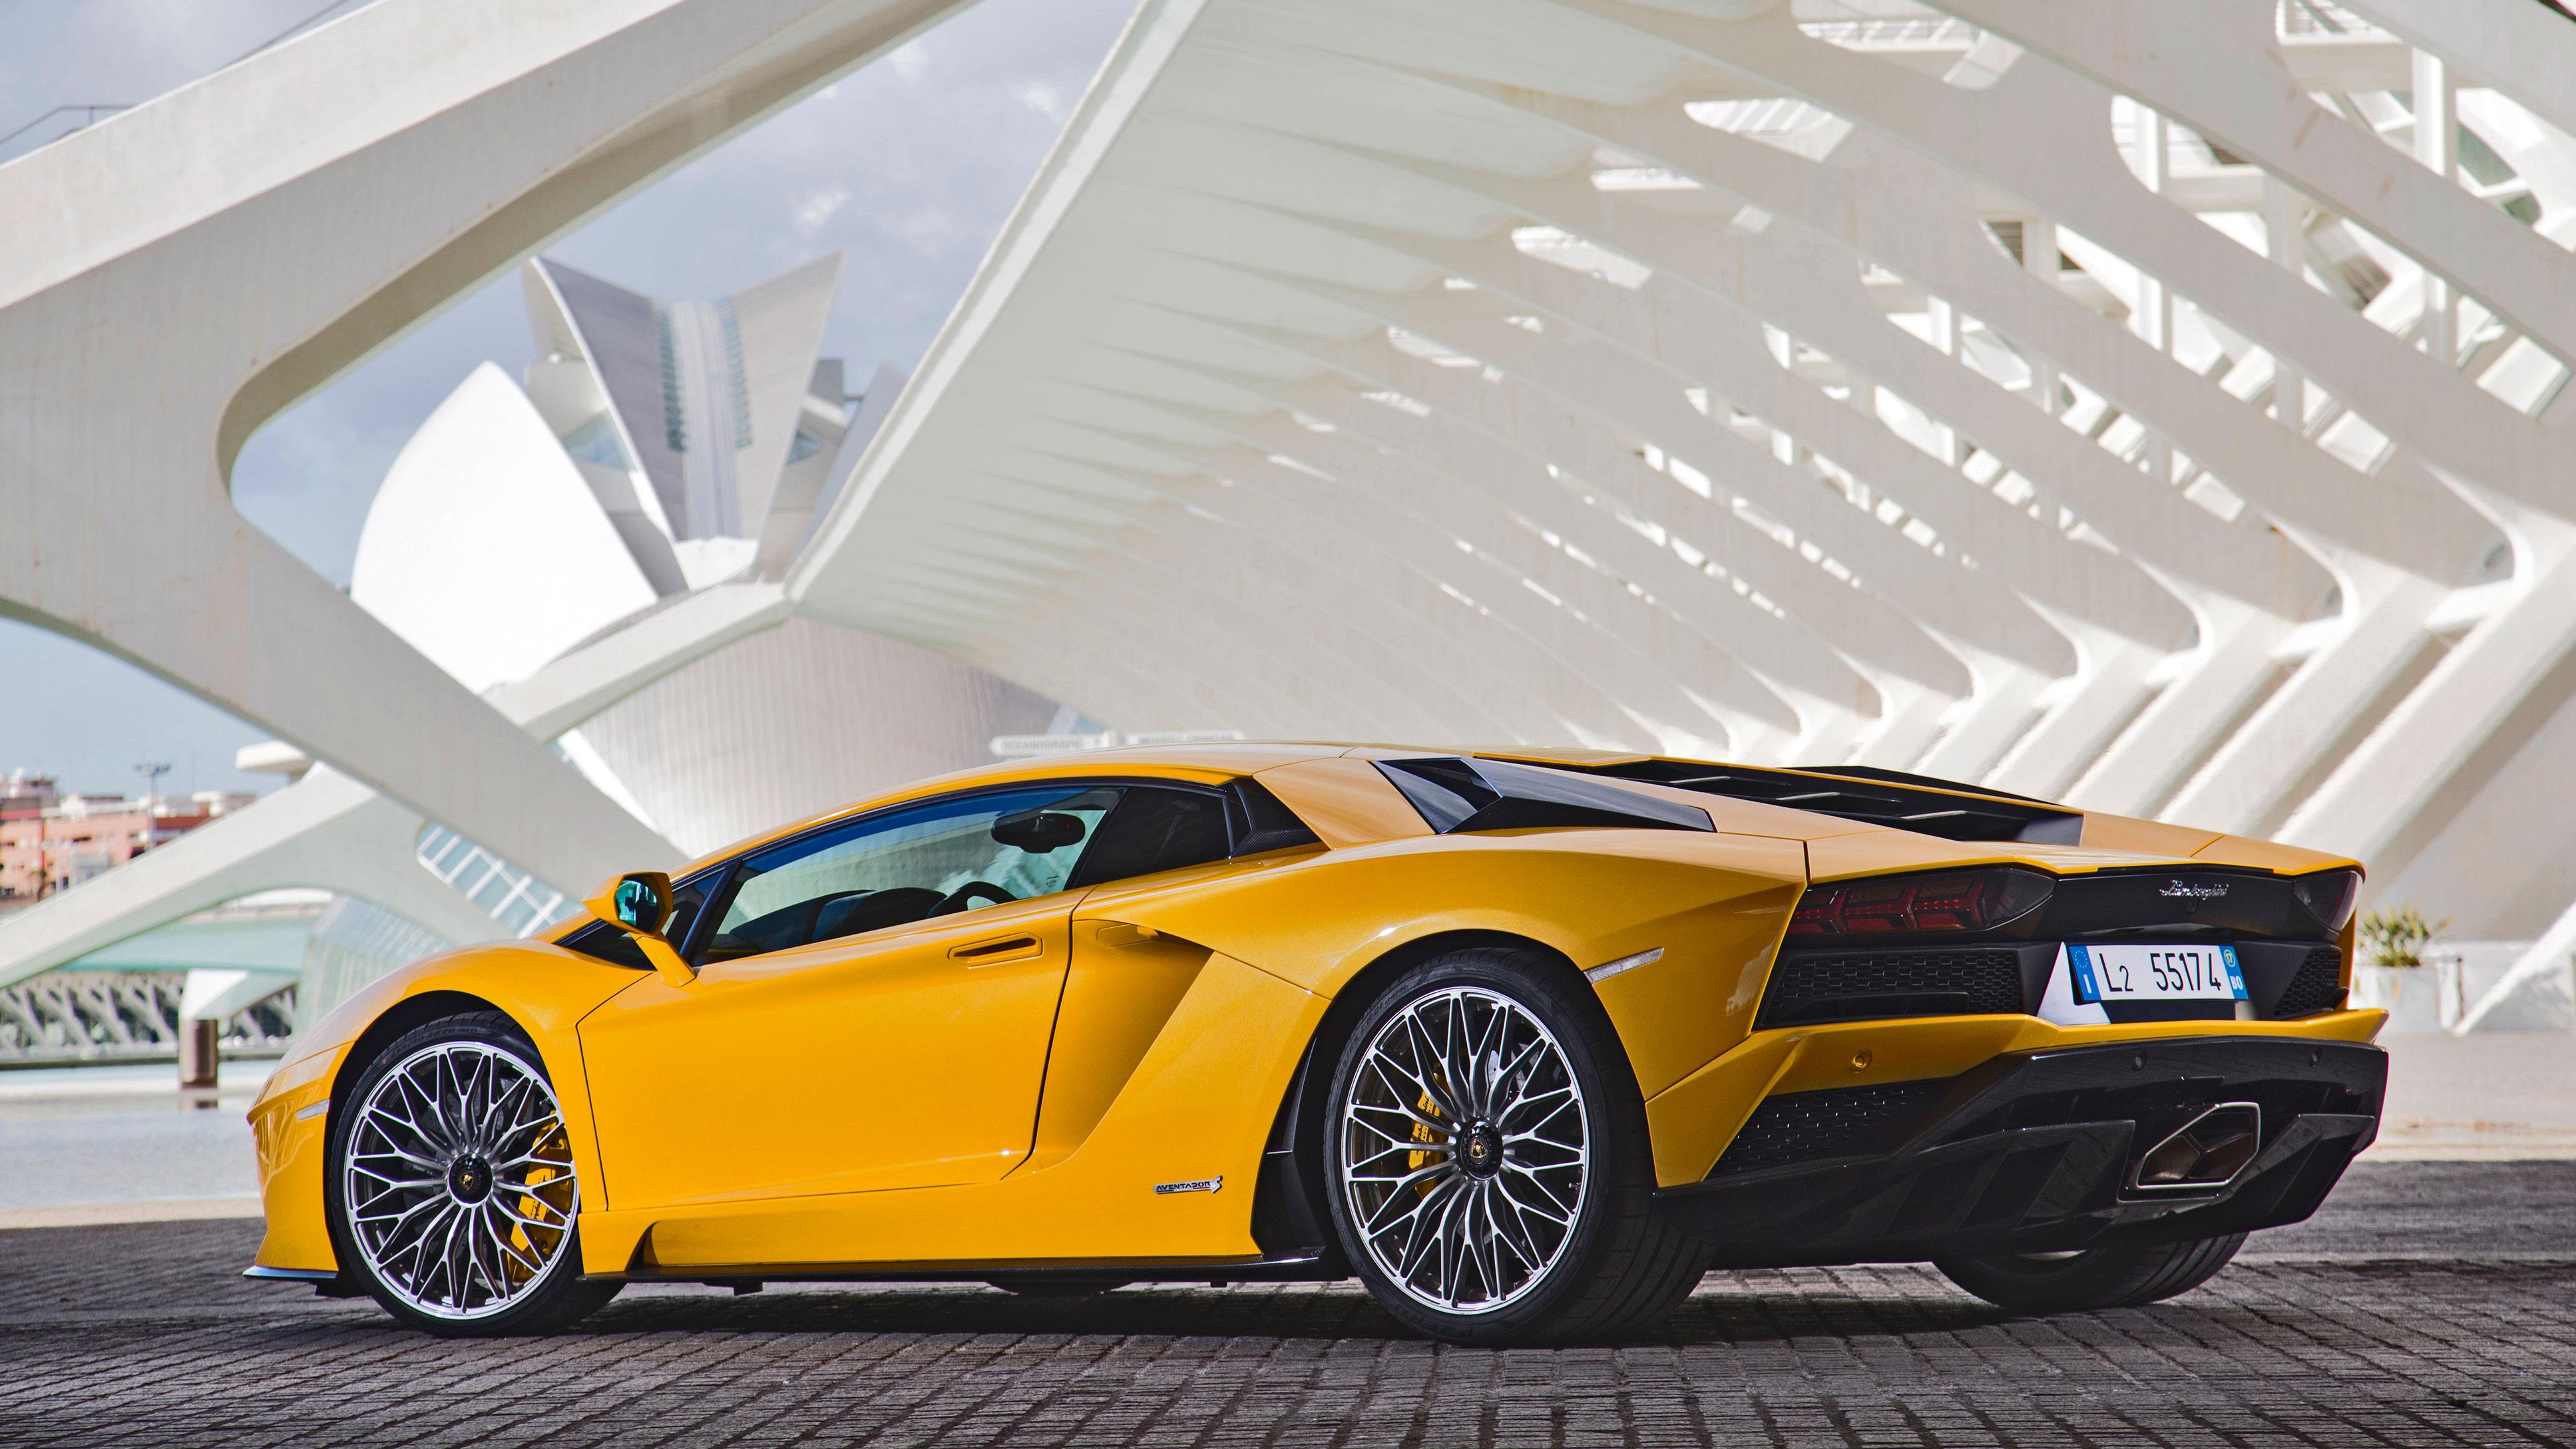 Lamborghini Used Cars For Sale On Auto Trader Uk